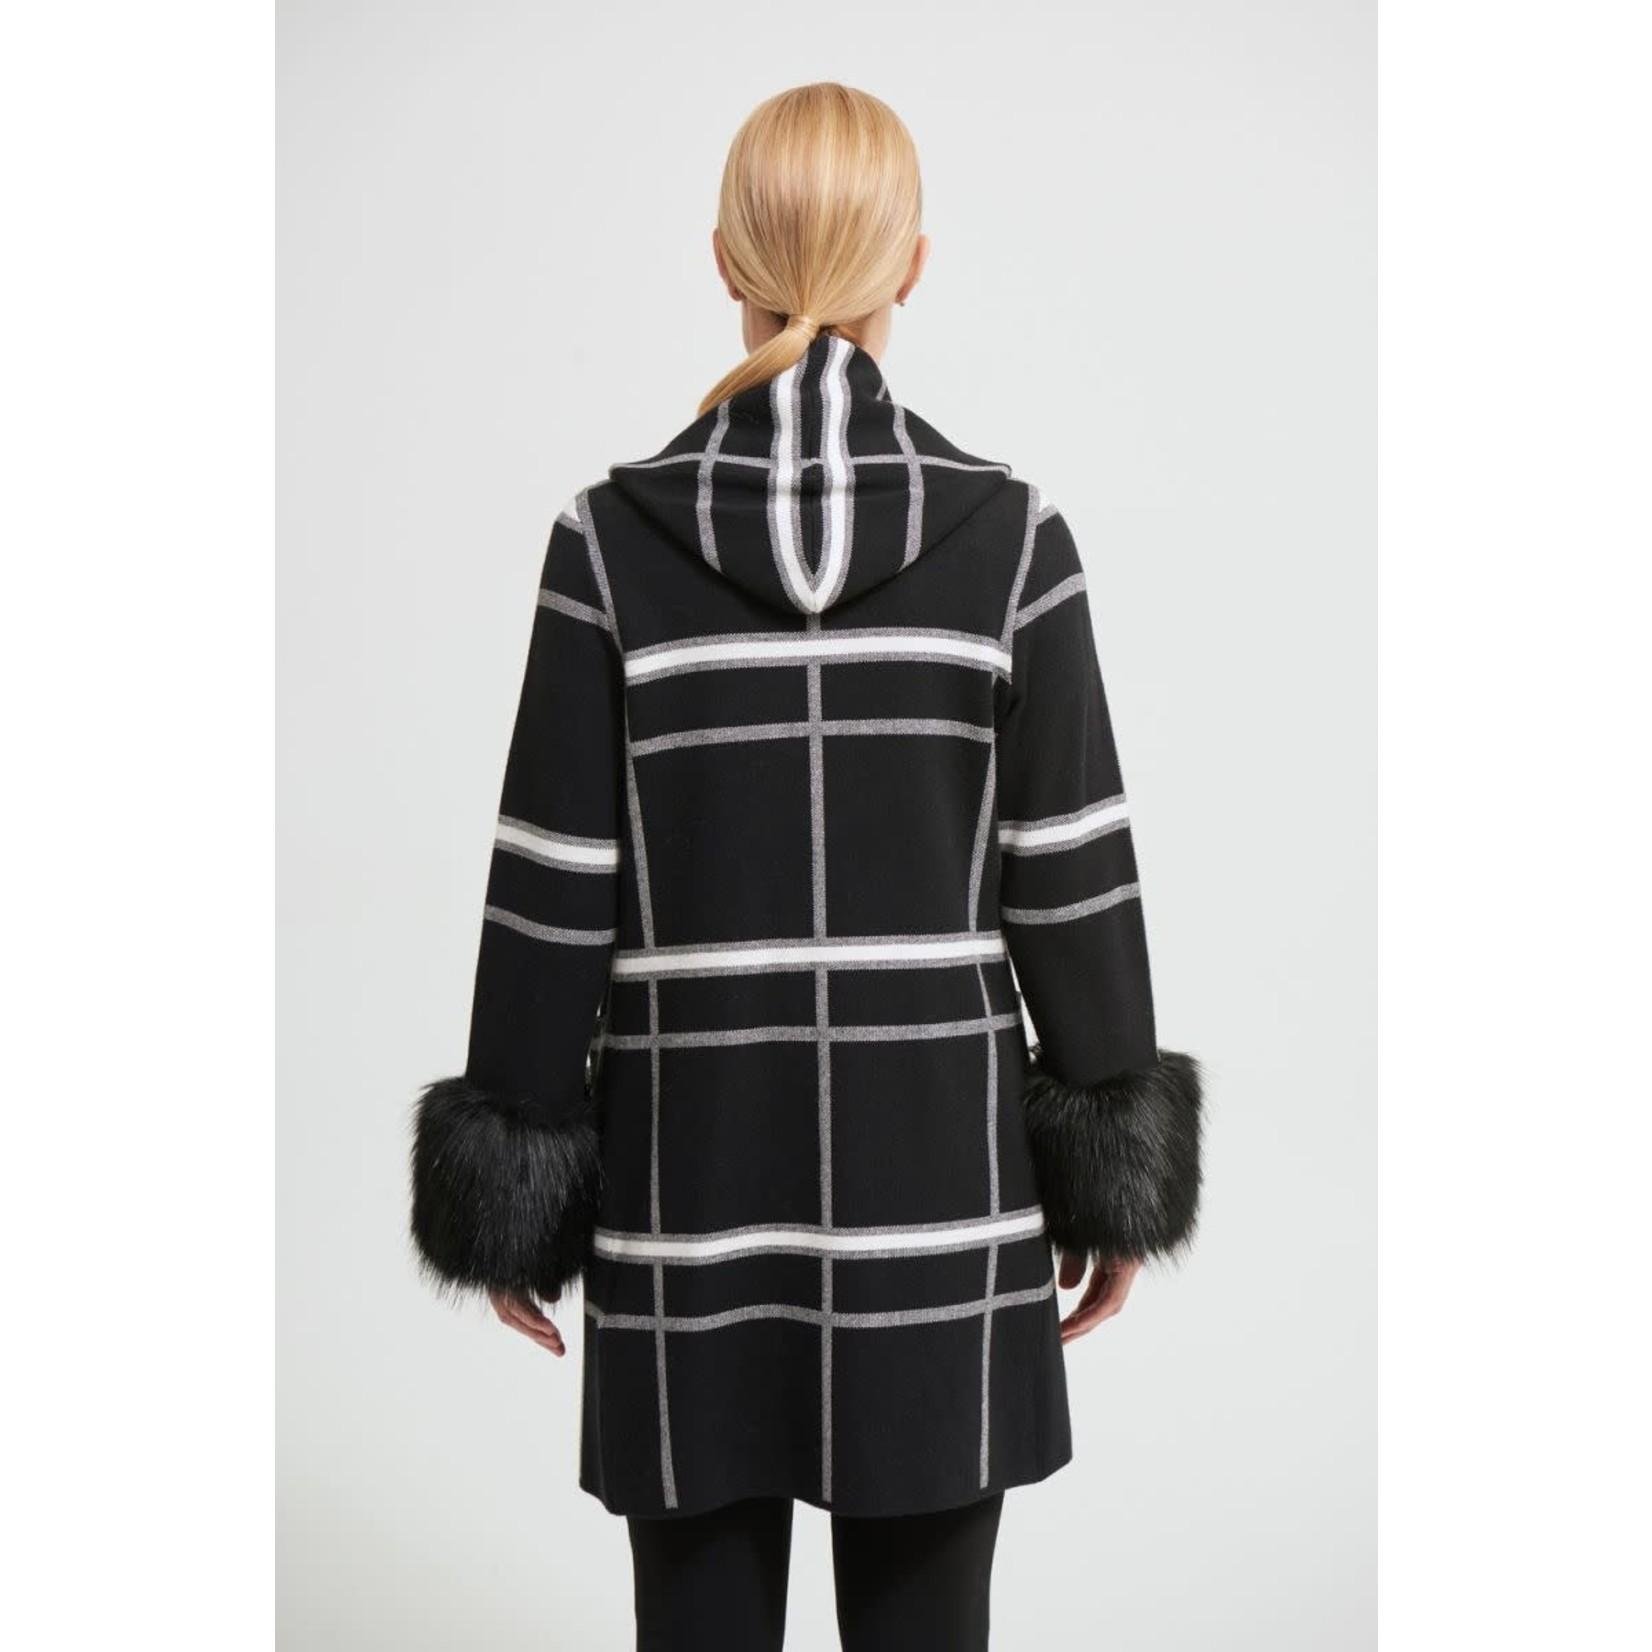 Joseph Ribkoff Joseph Ribkoff Black/Vanilla Faux Fur Cuff Coat Style 213904